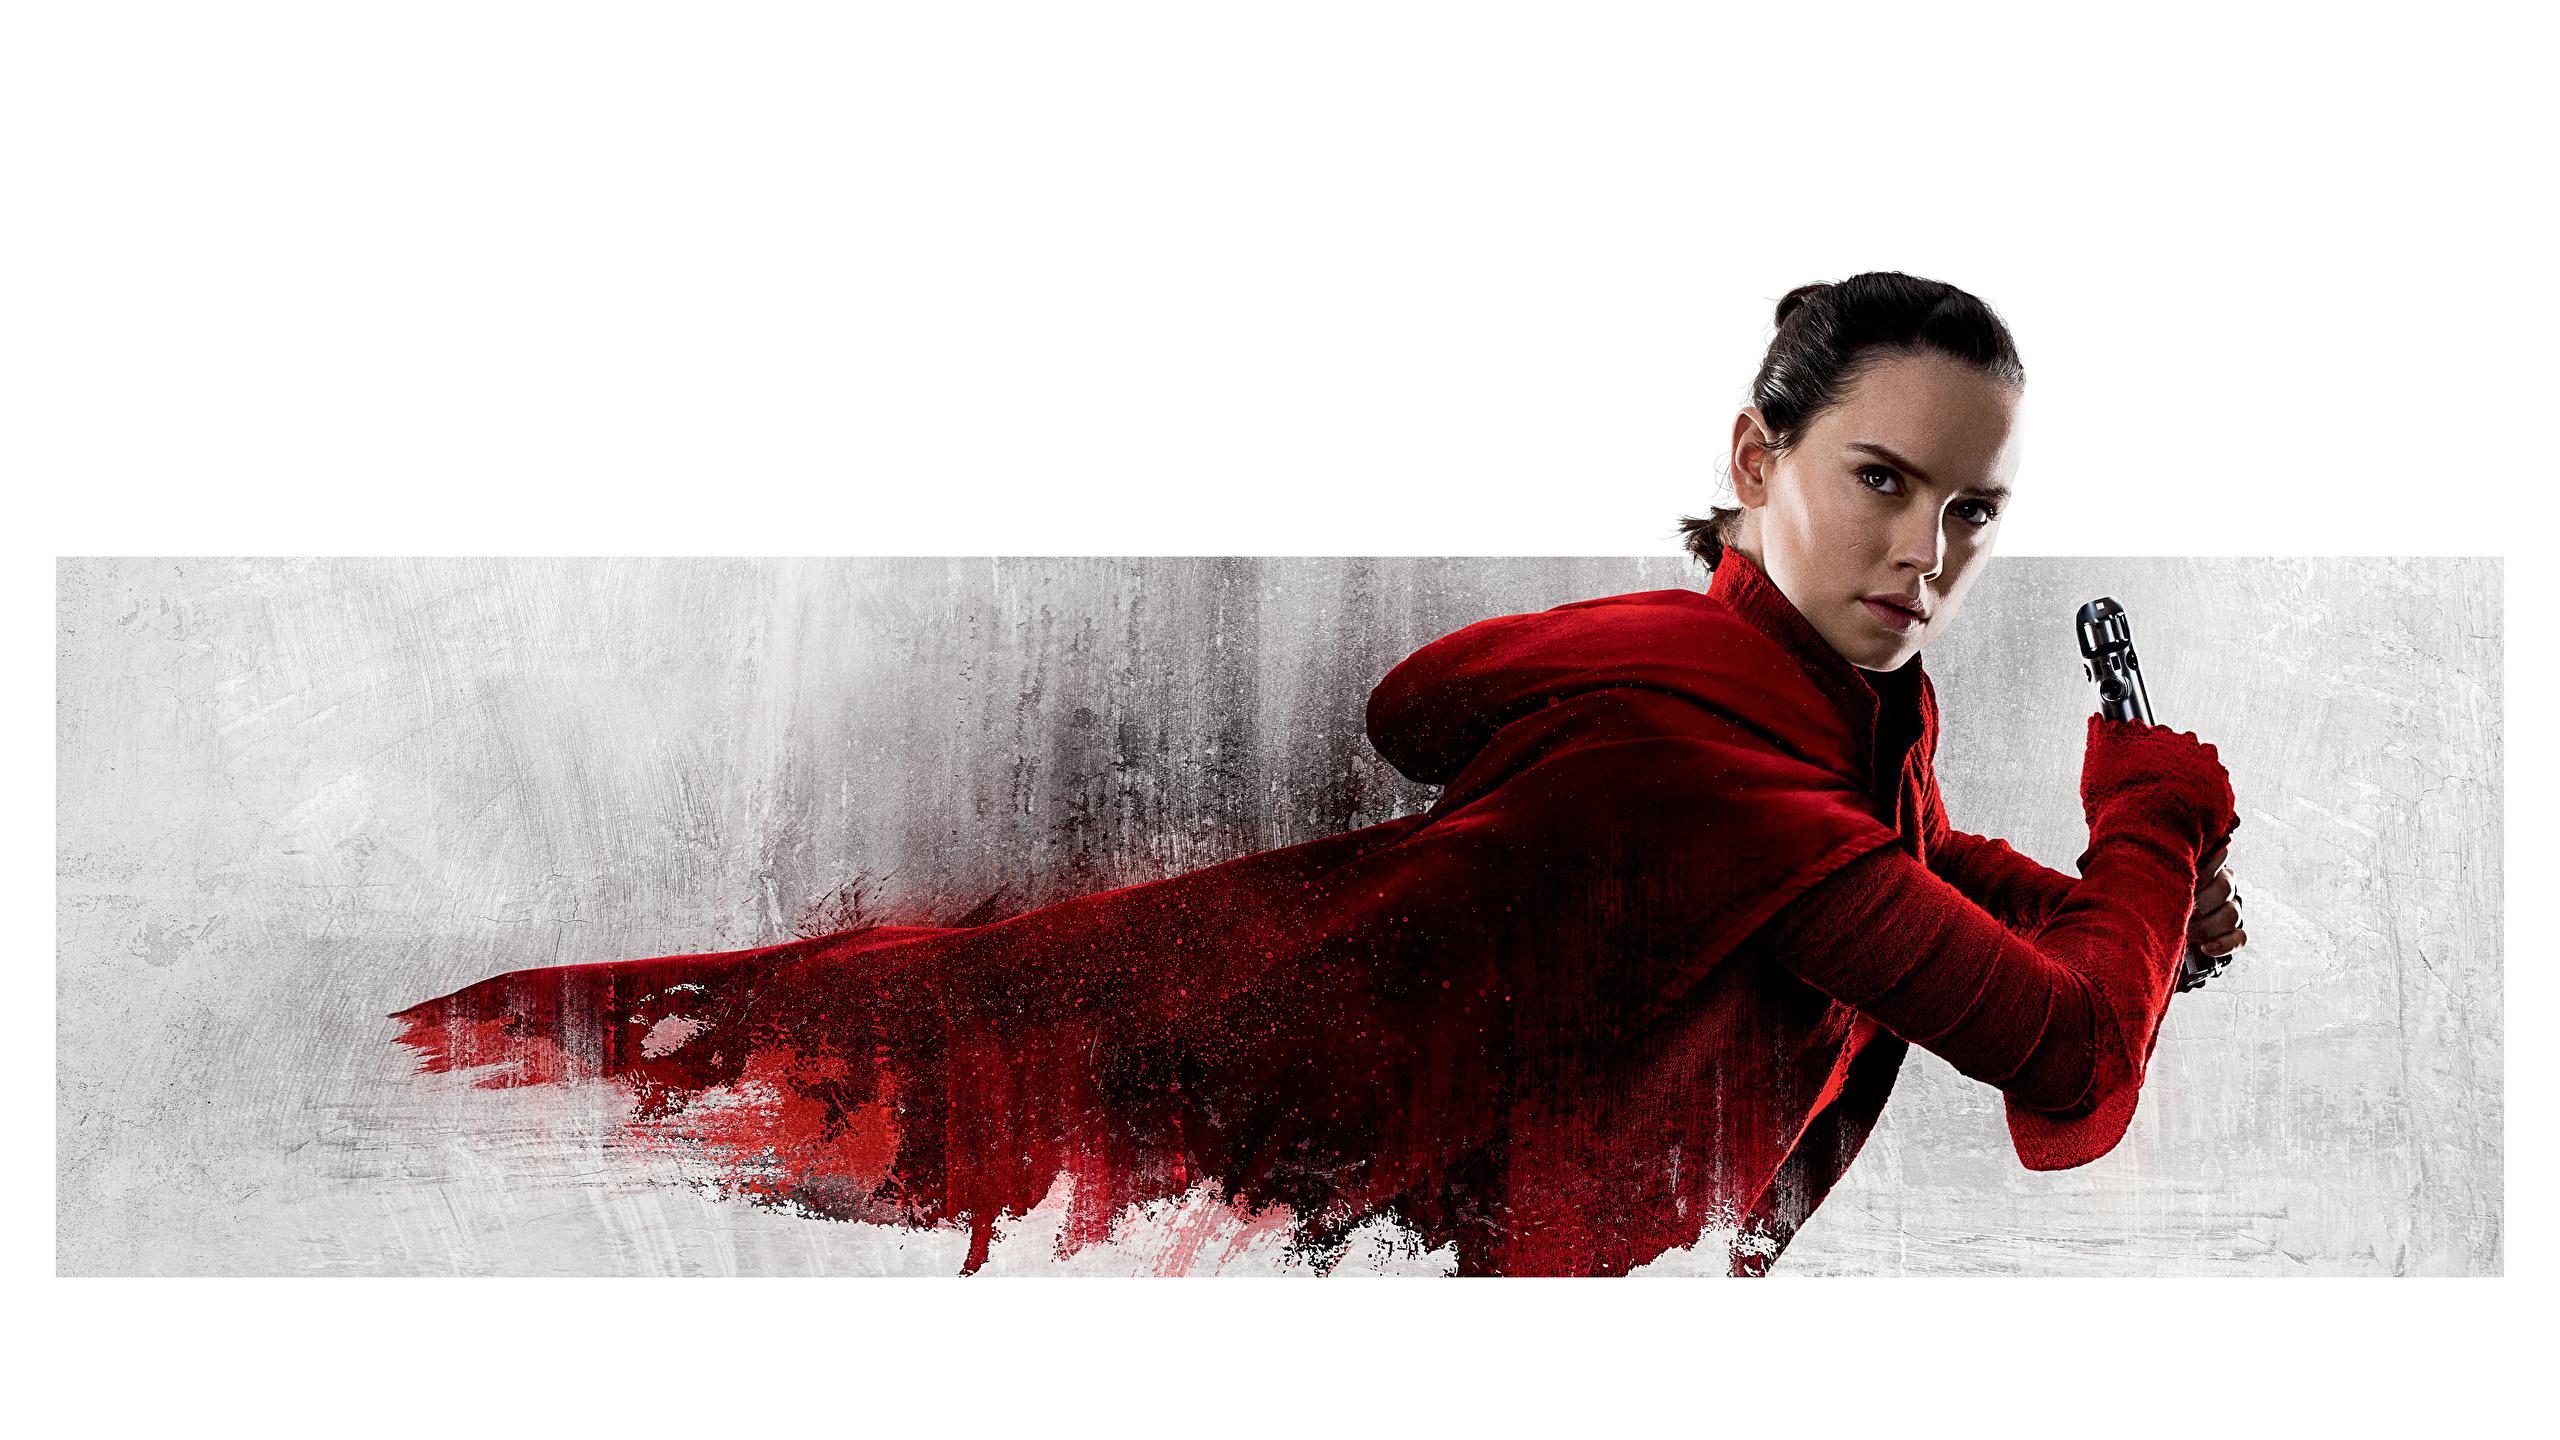 Image Star Wars The Last Jedi Daisy Ridley Rey Female 2560x1440